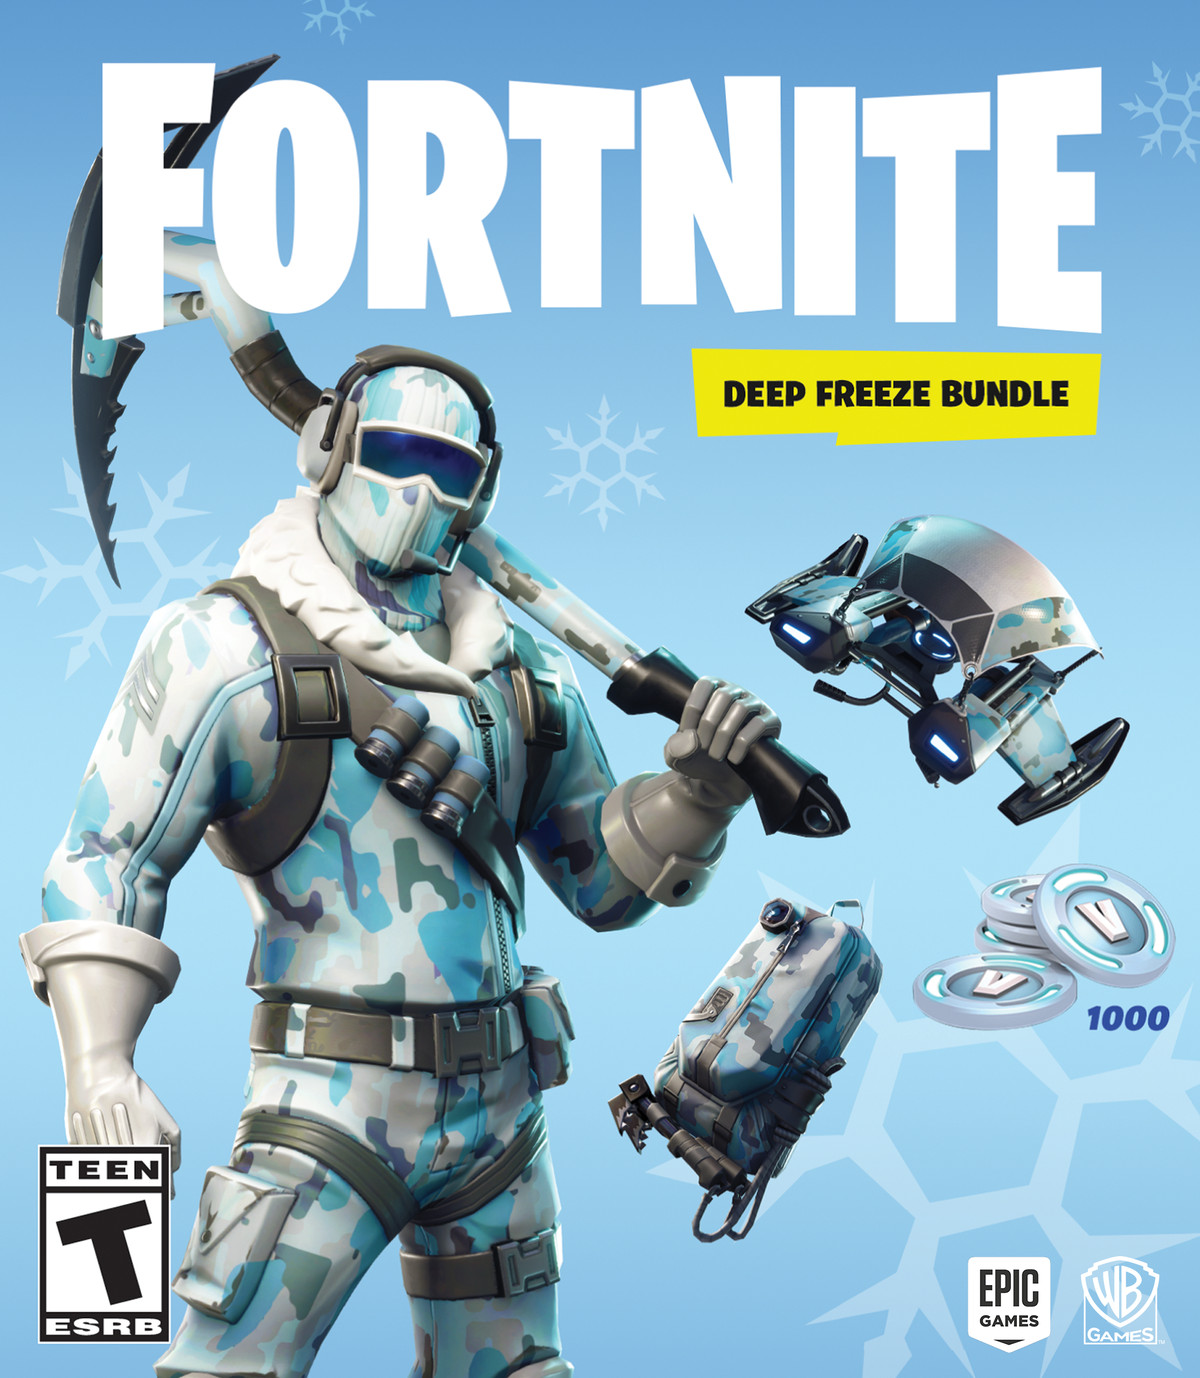 The box art for Fortnite: Deep Freeze Bundle